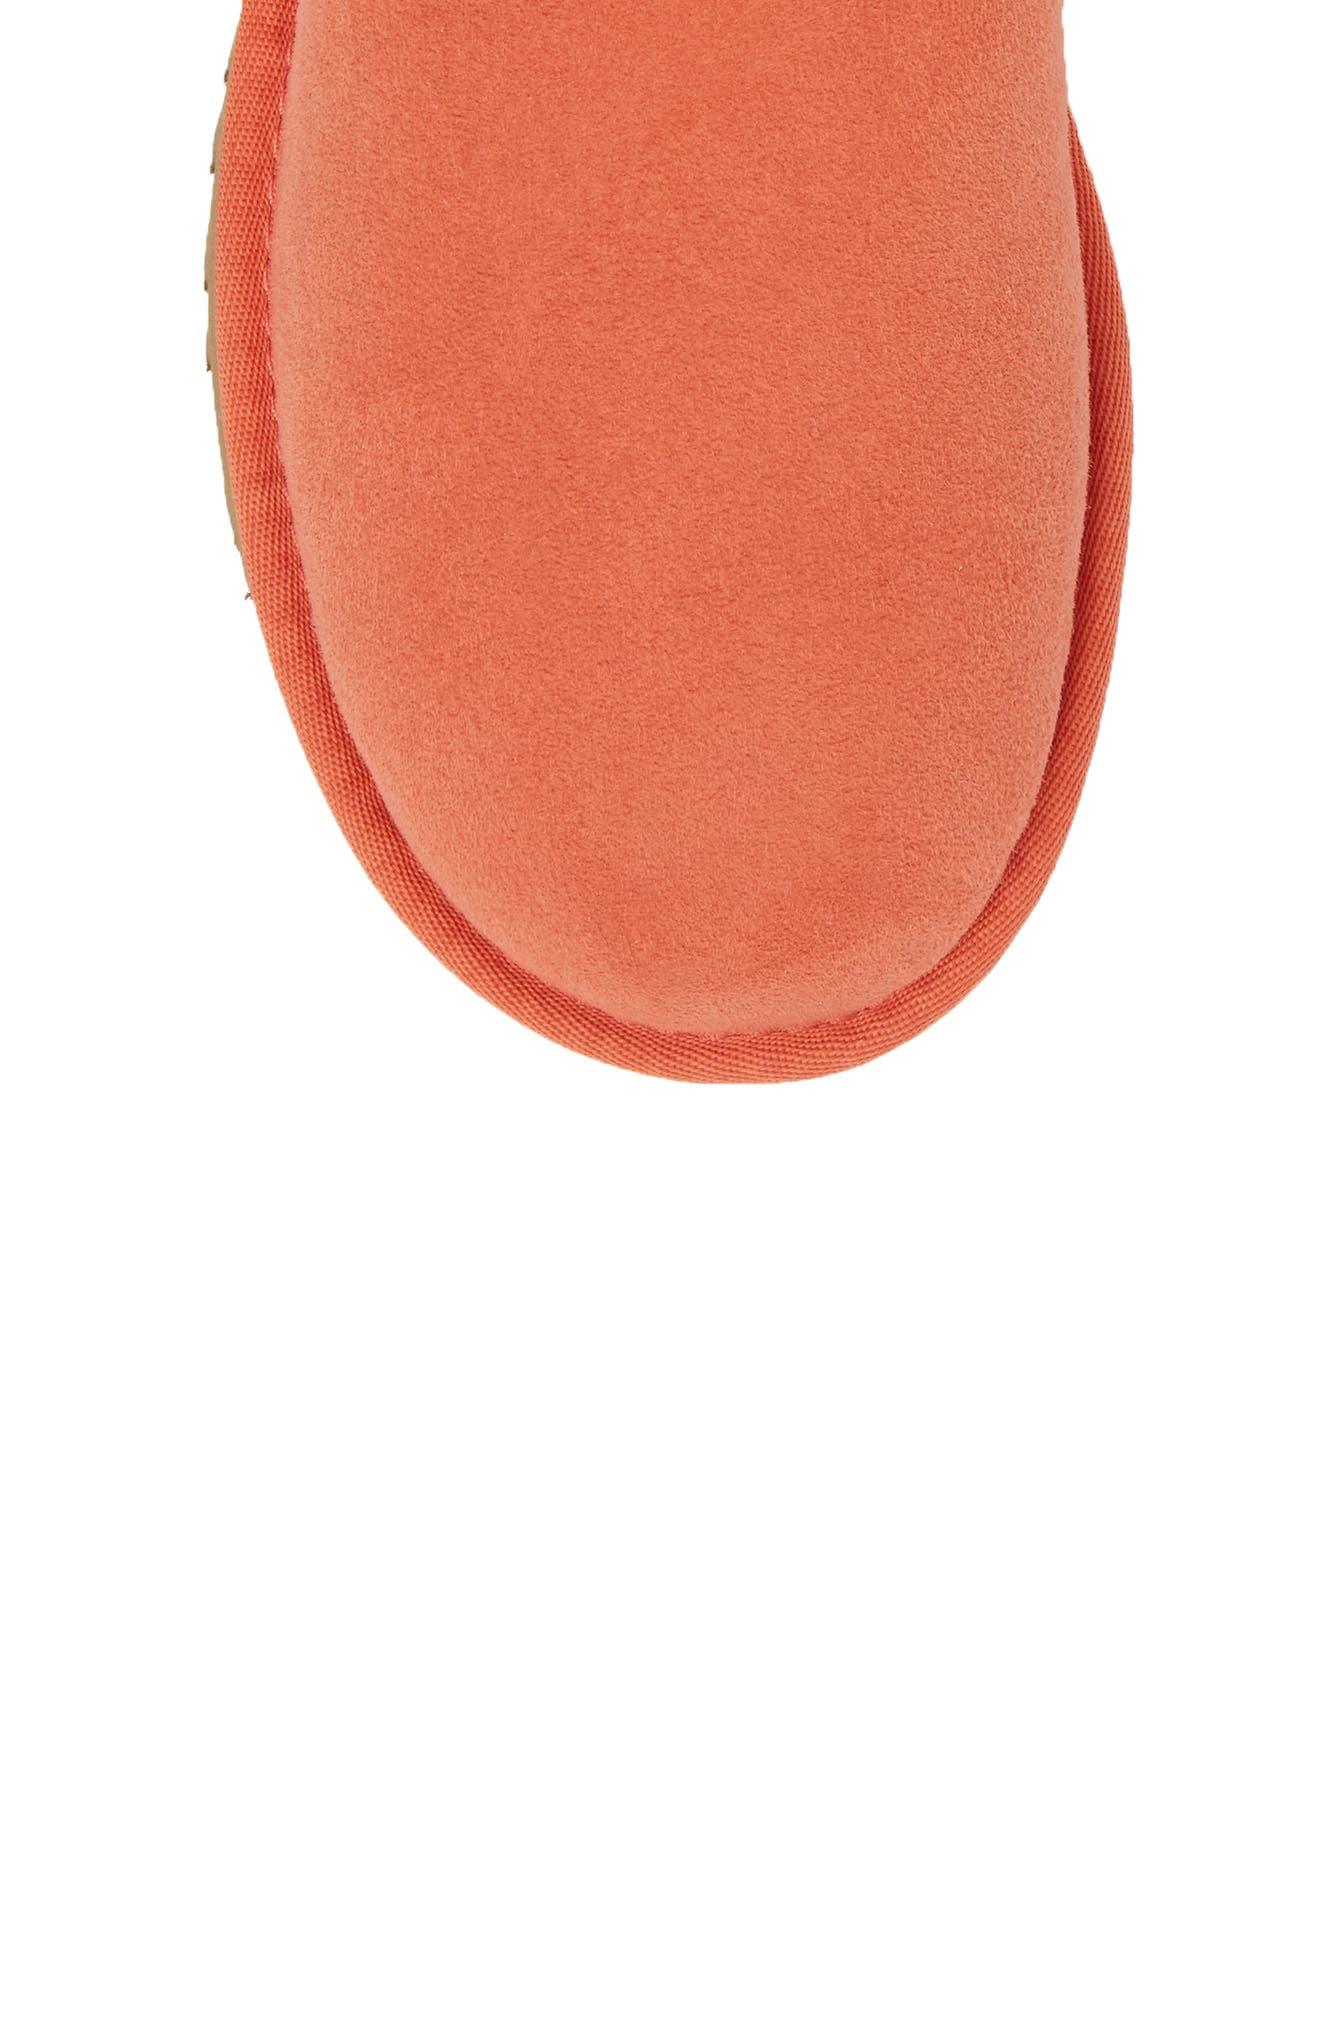 ,                             Classic Mini II Genuine Shearling Lined Boot,                             Alternate thumbnail 93, color,                             834